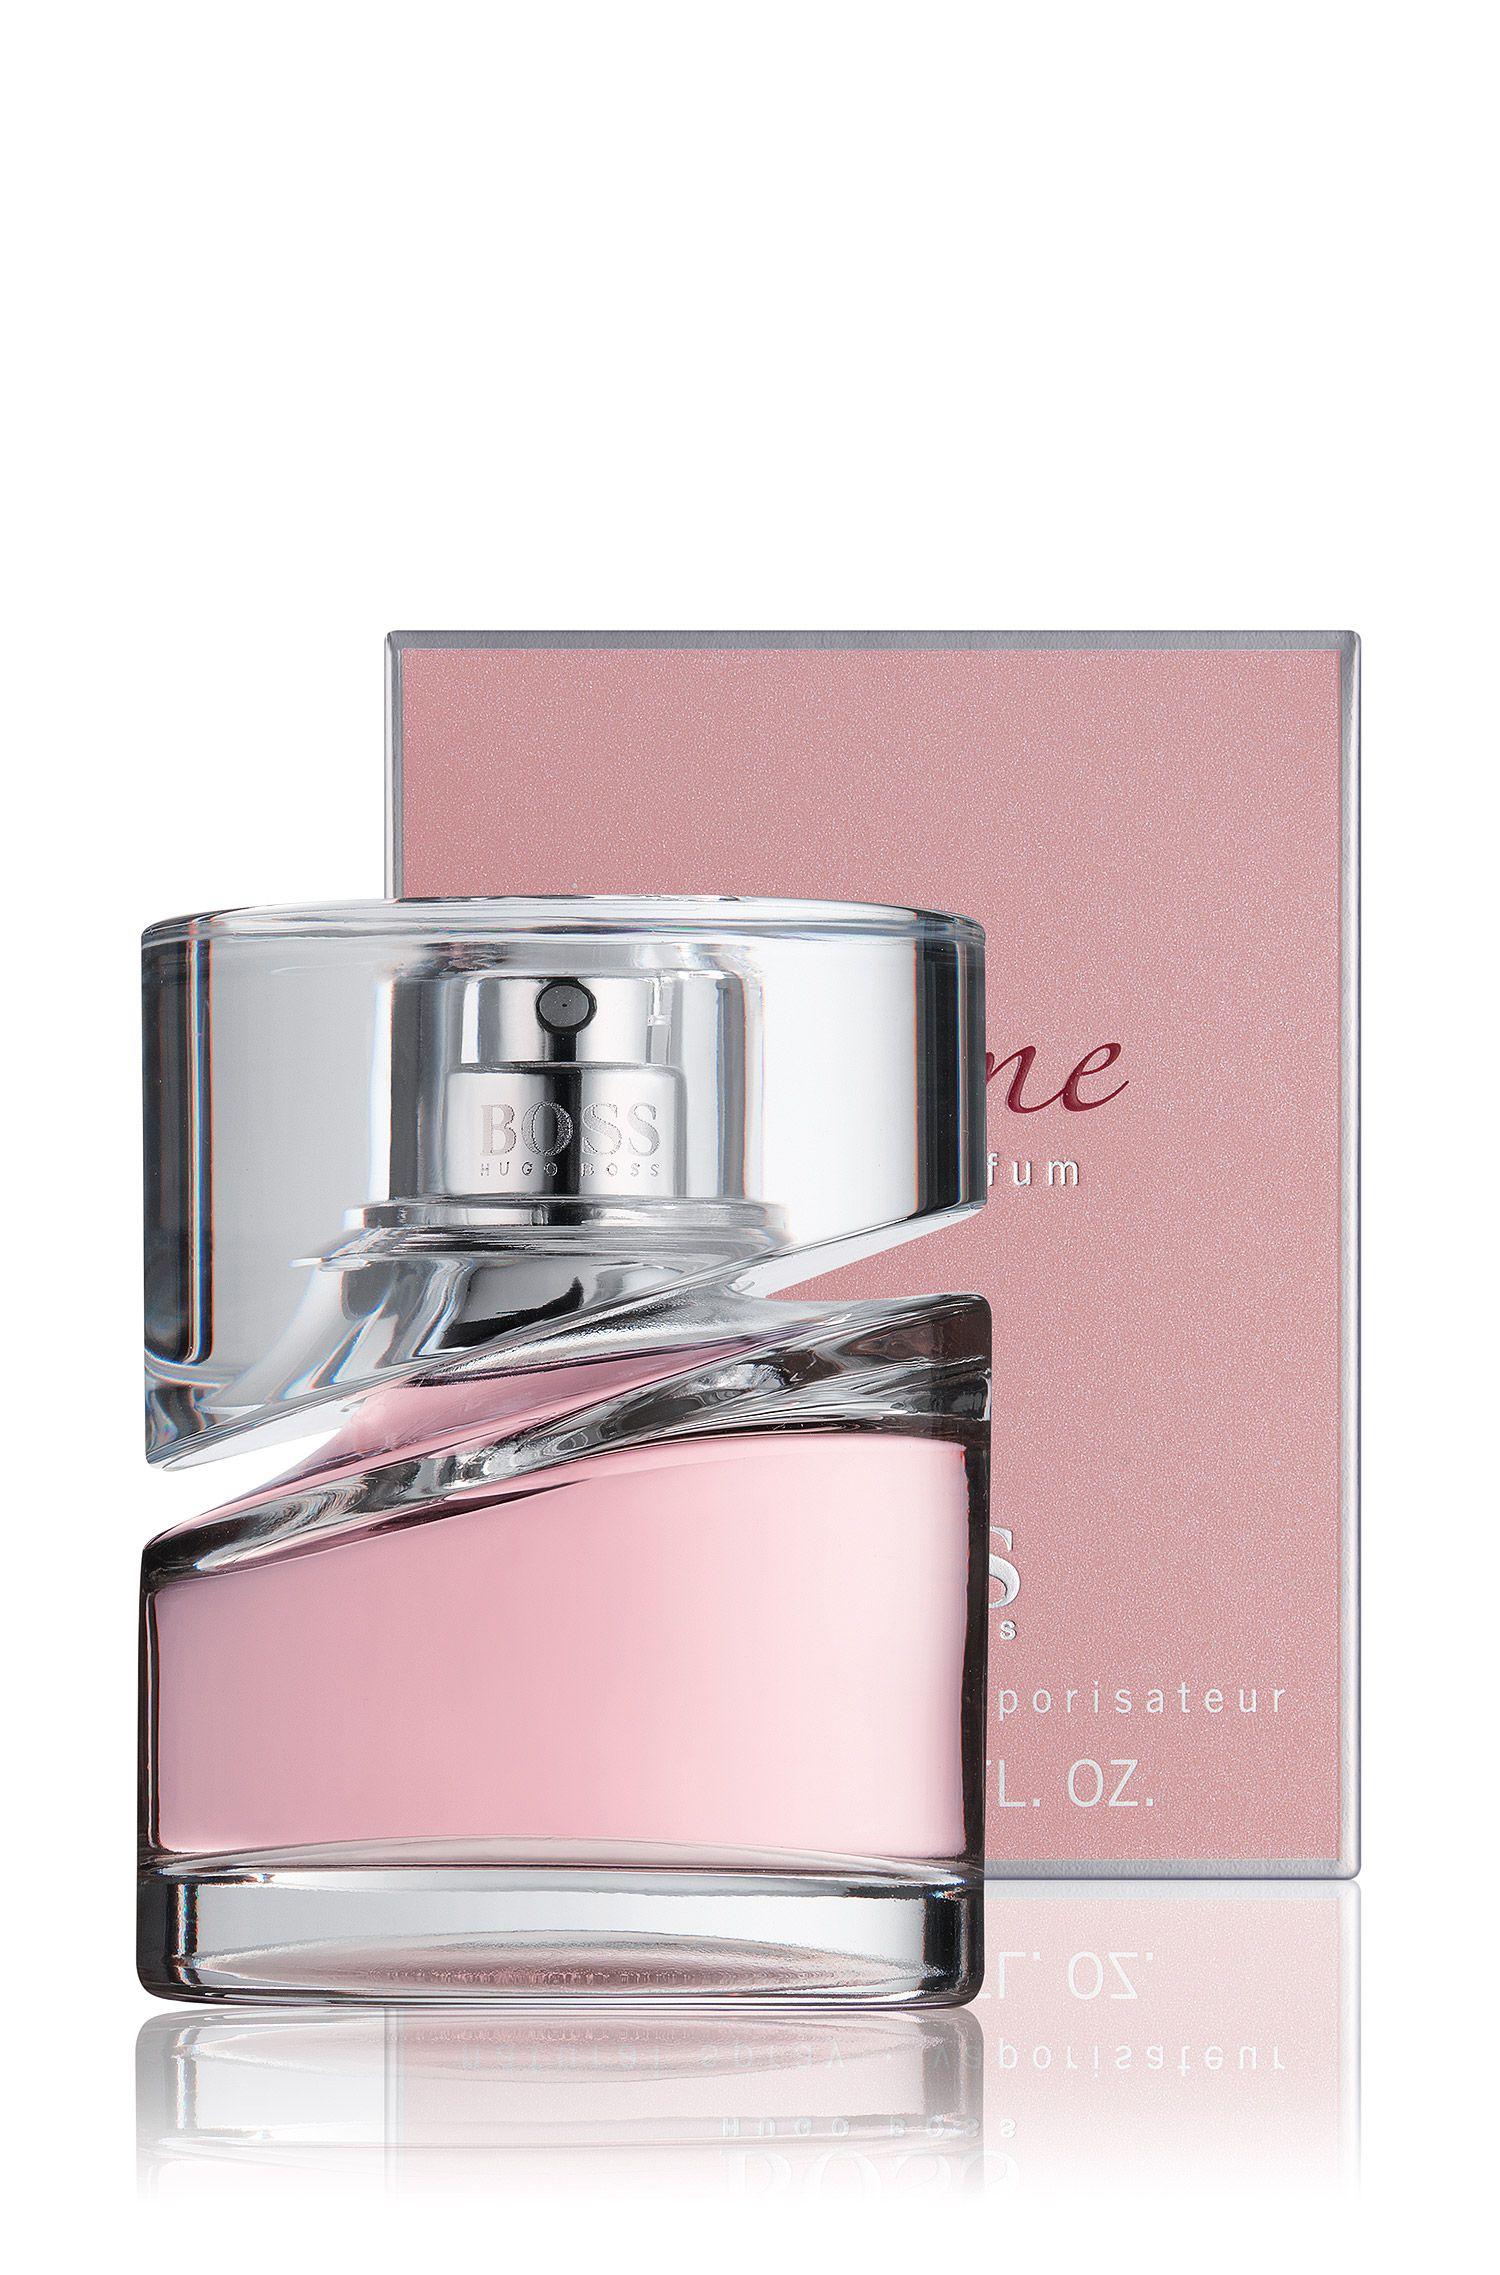 Eau de parfum Femme by BOSS de 50ml